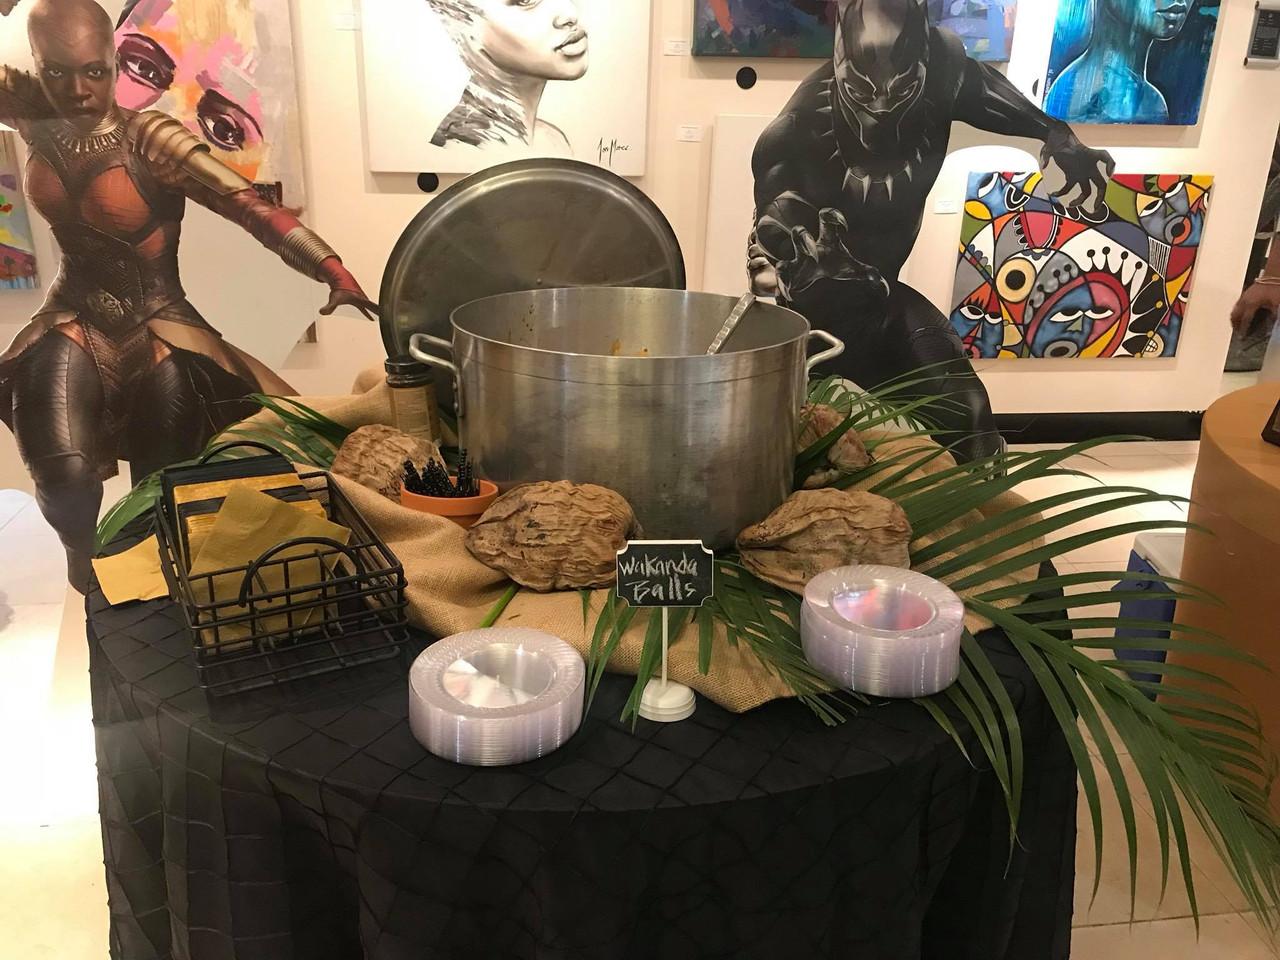 Wakanda Wednesday_Food setup.jpg